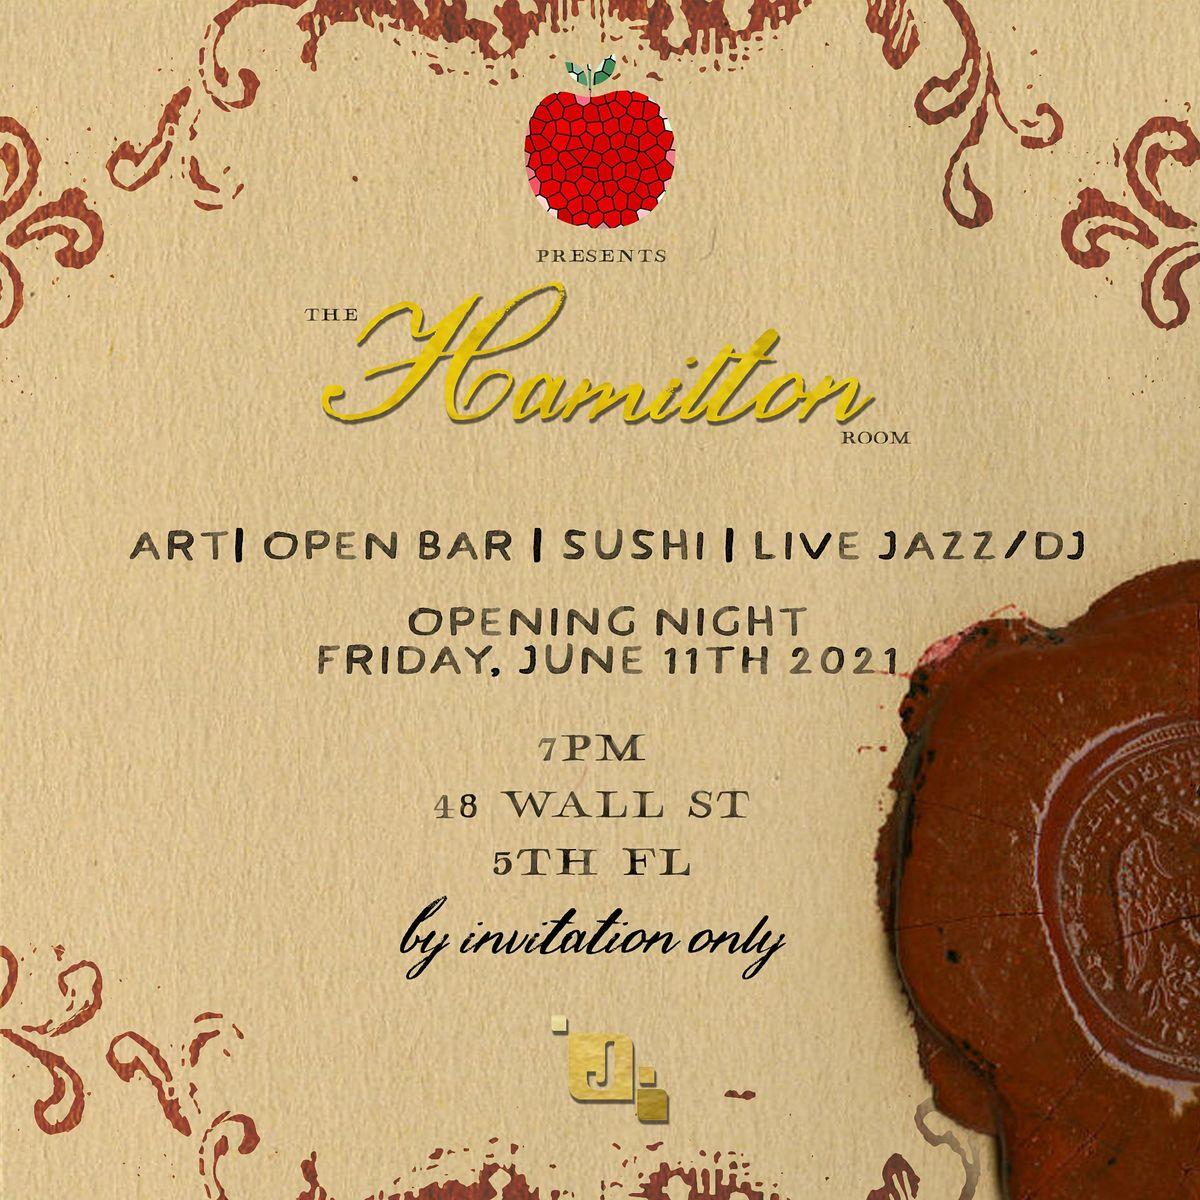 ART APPLE Presents The Hamilton Room Opening Night